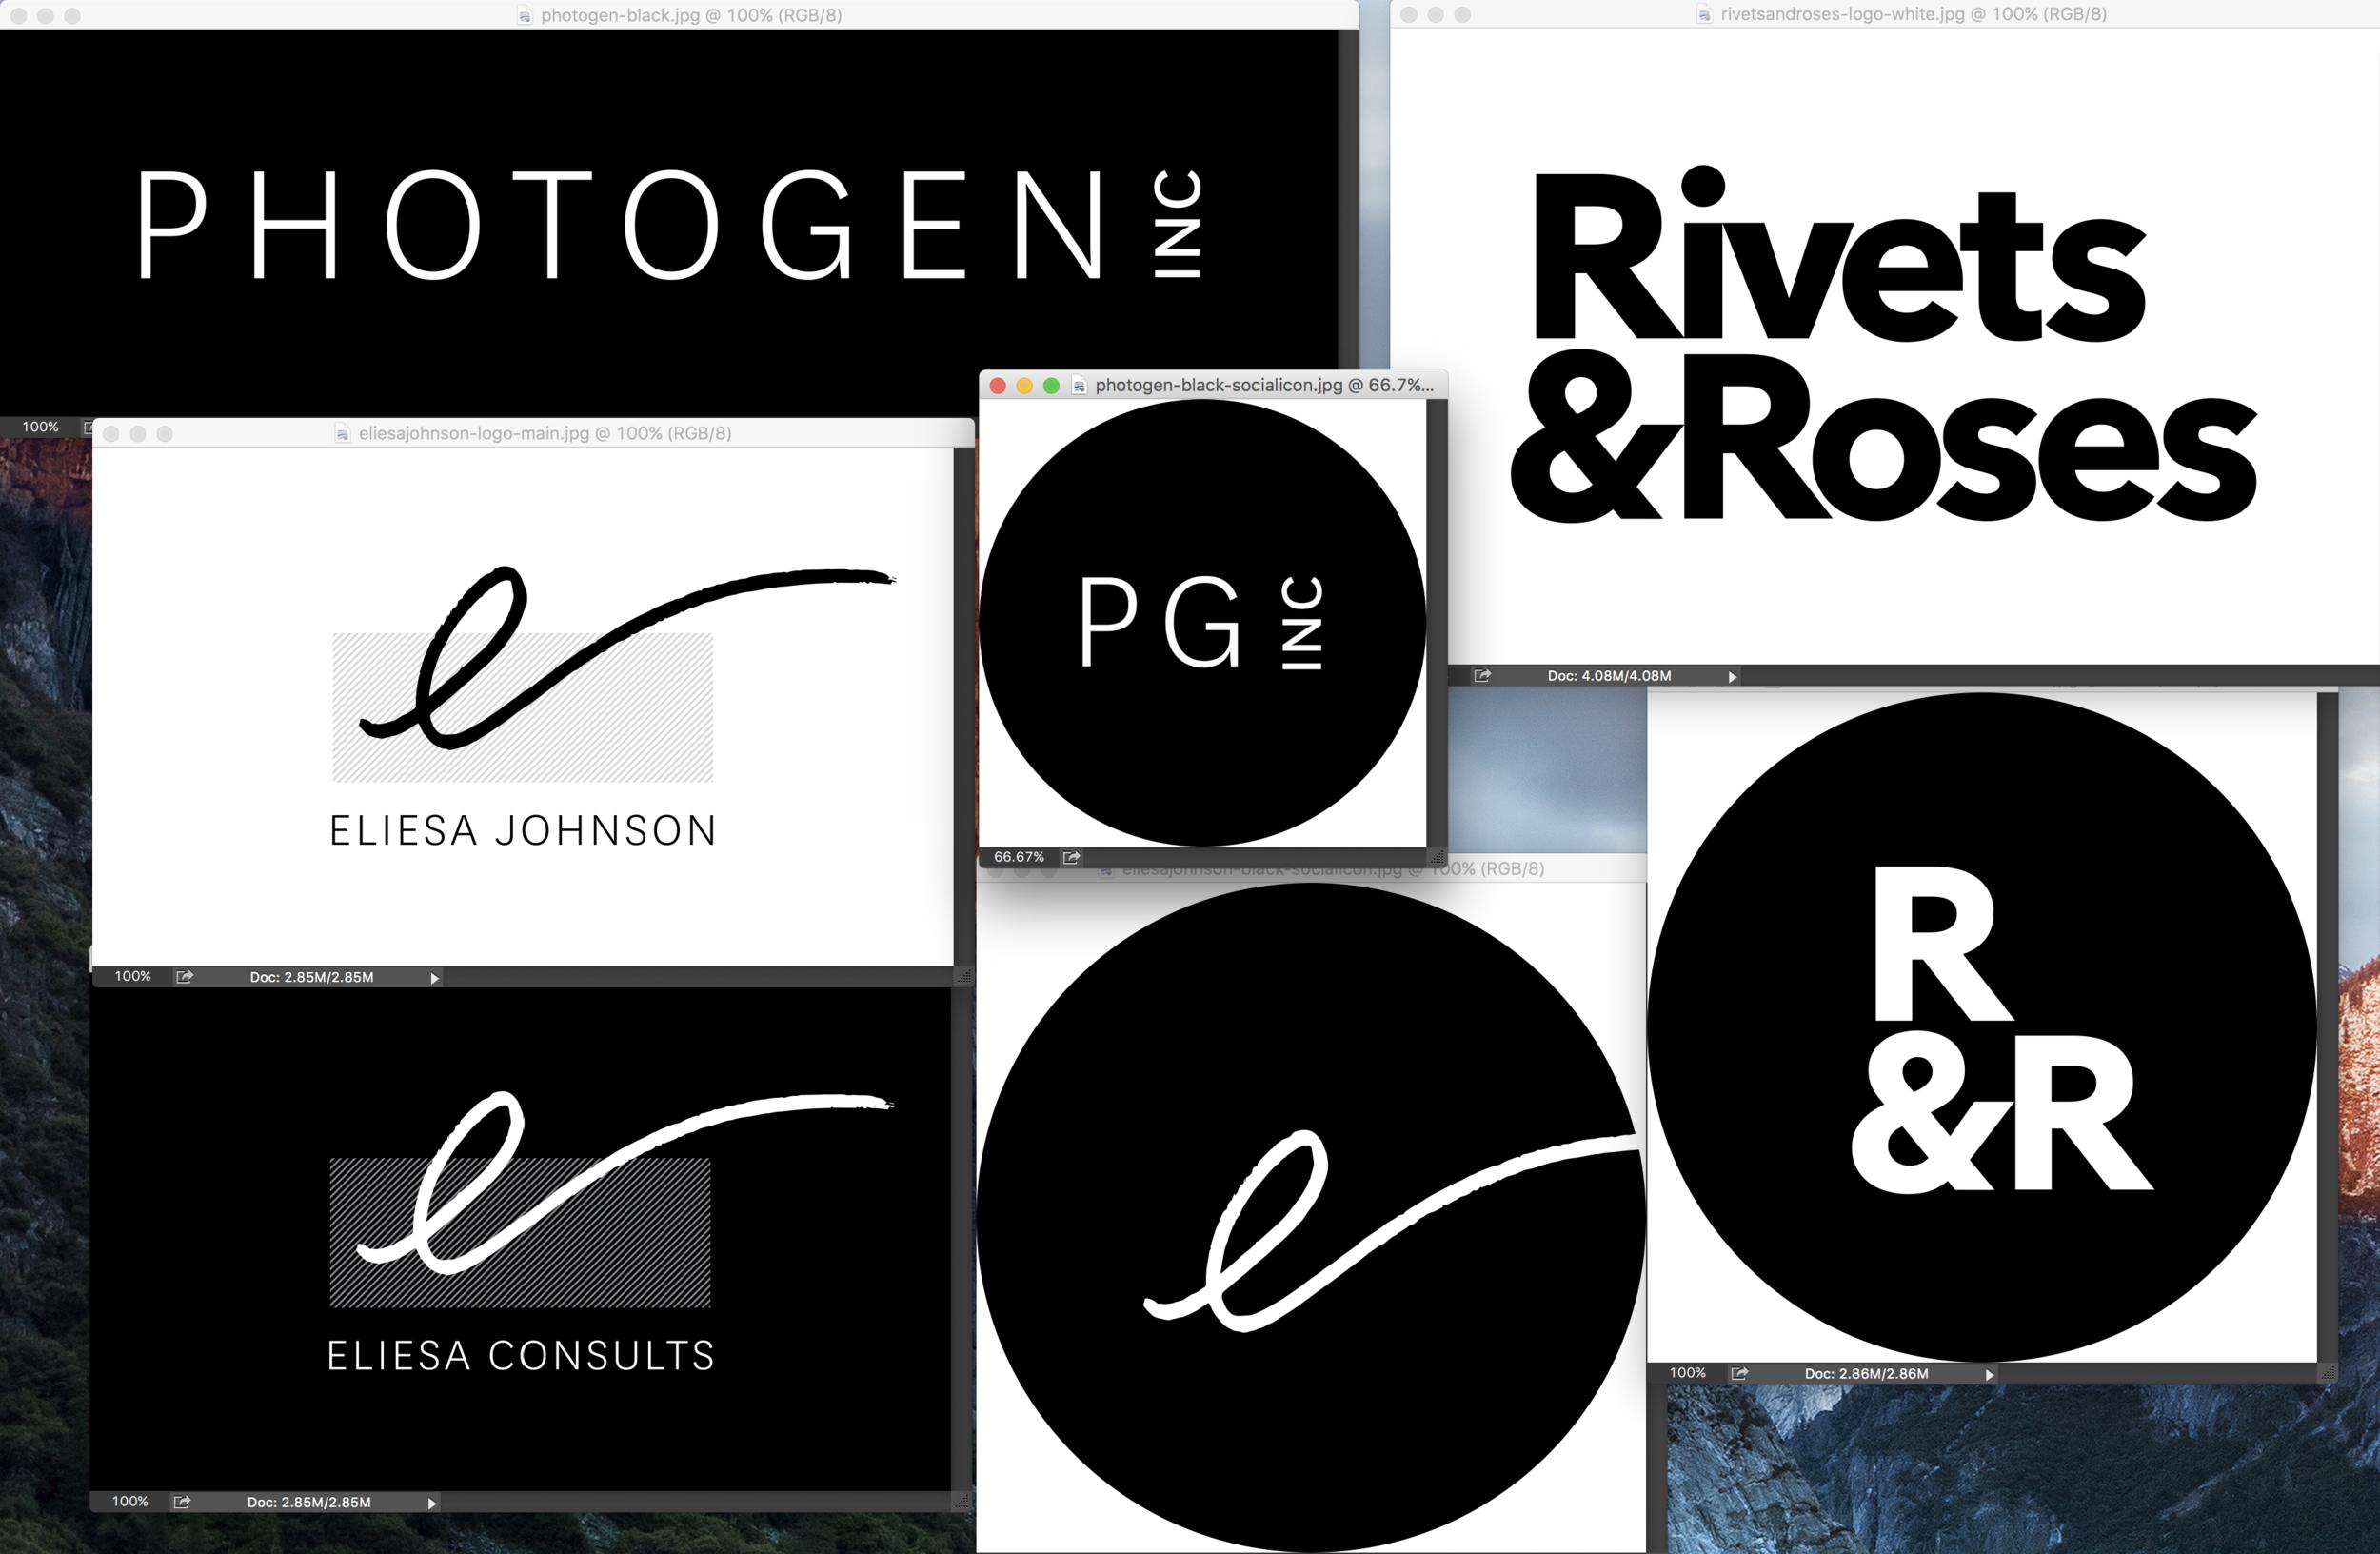 Brand Identity work by Dschwen